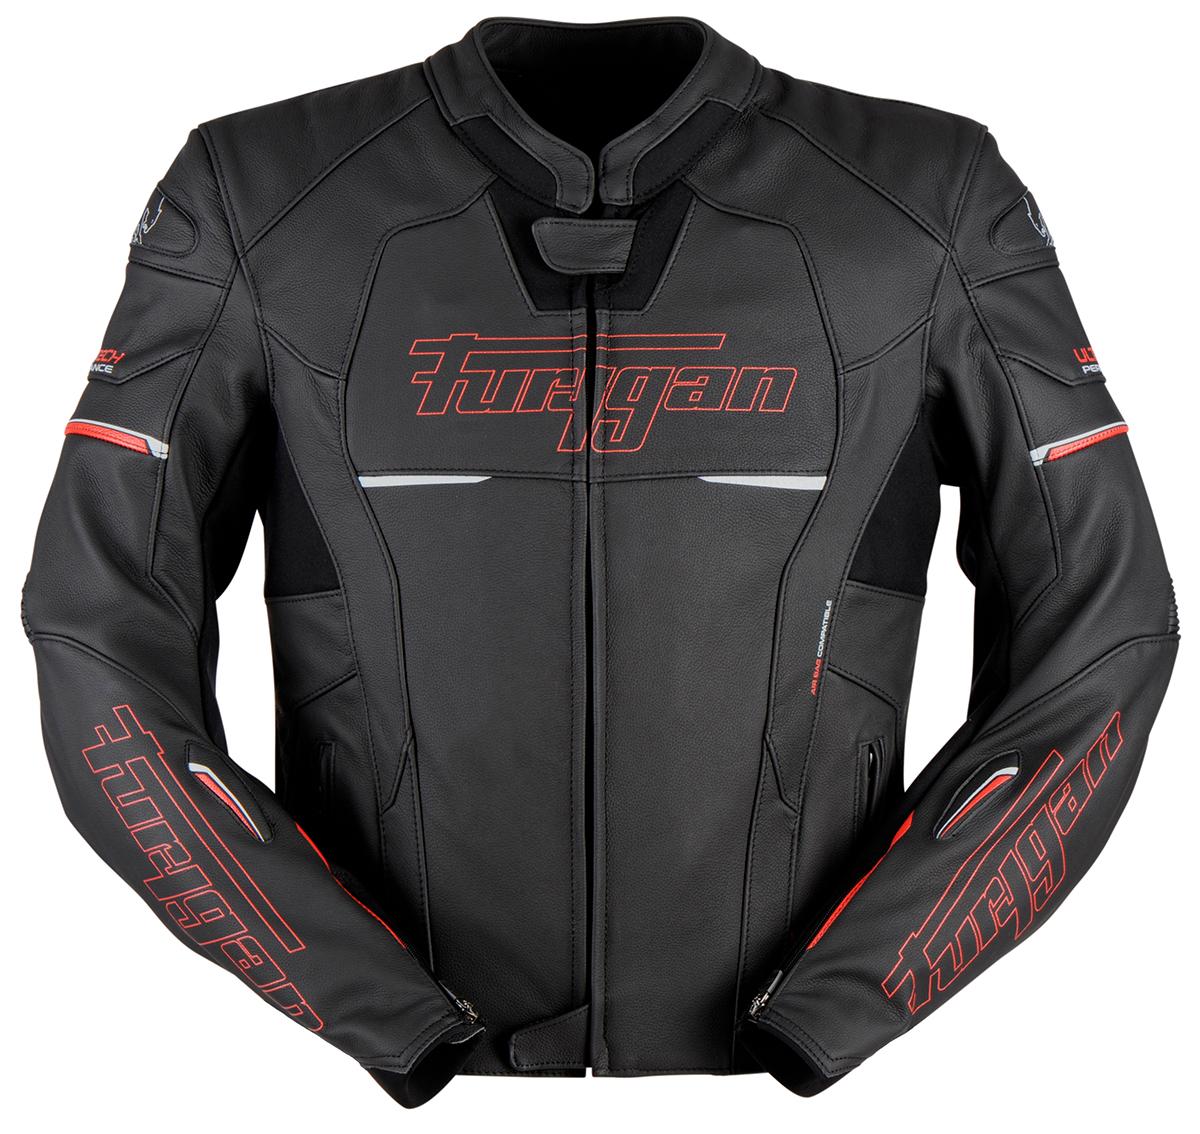 Furygan 6021-108 Jack Nitros Black/Red 3XL